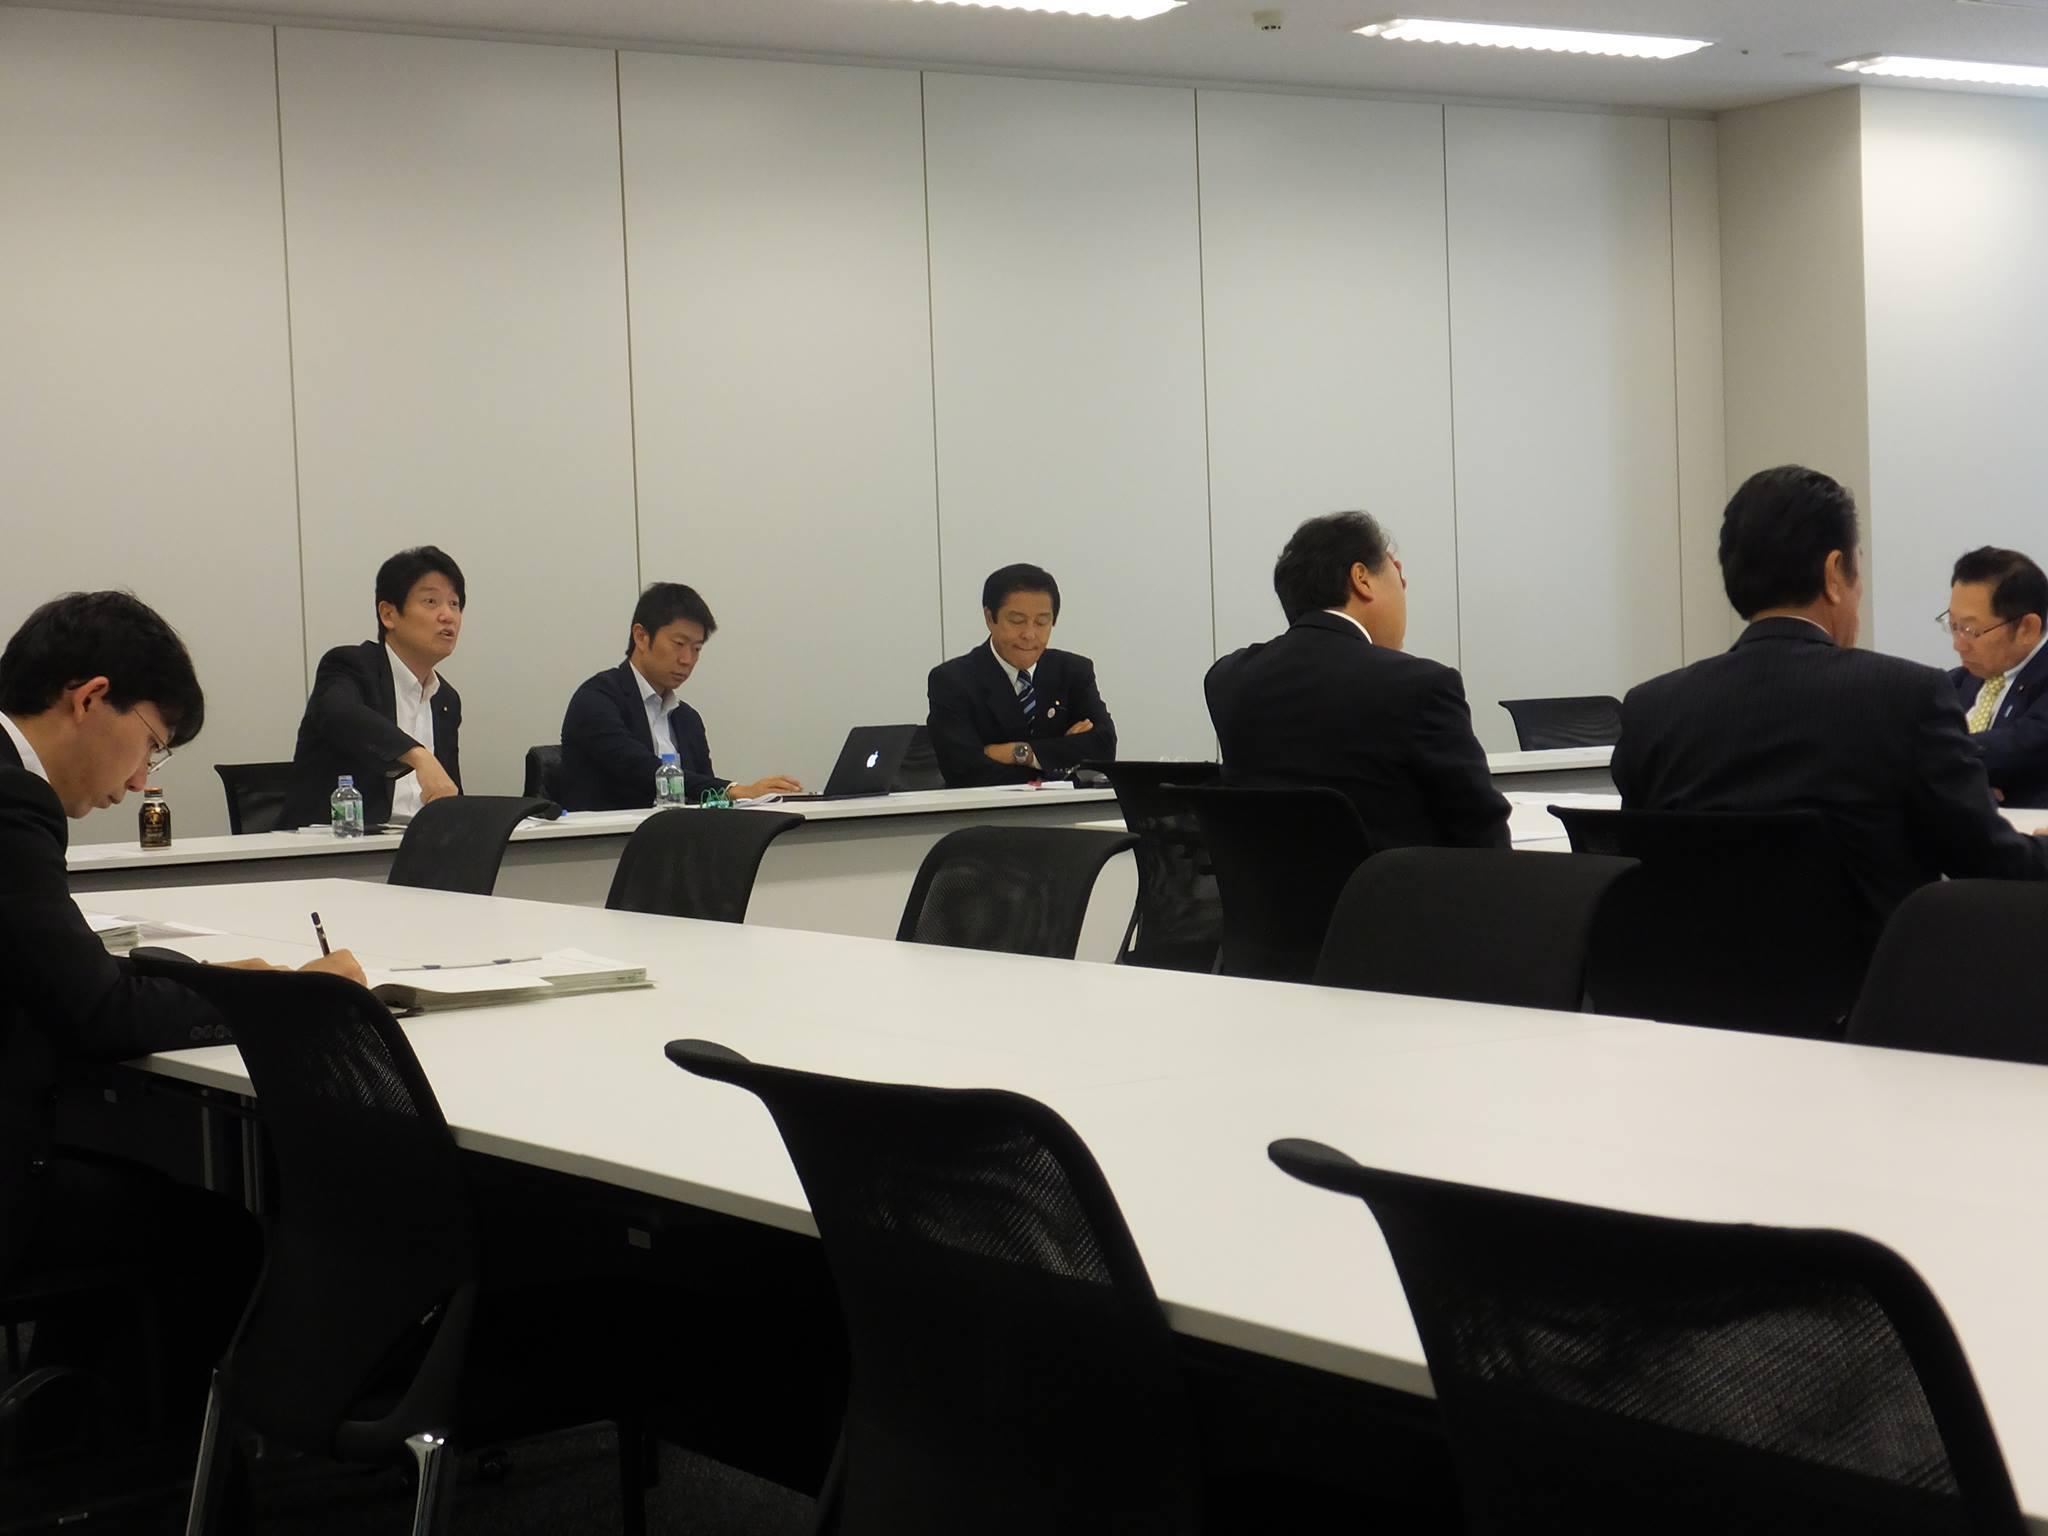 2014.10.24 道州経済部会 特定土砂等の管理等に関する法律案(議